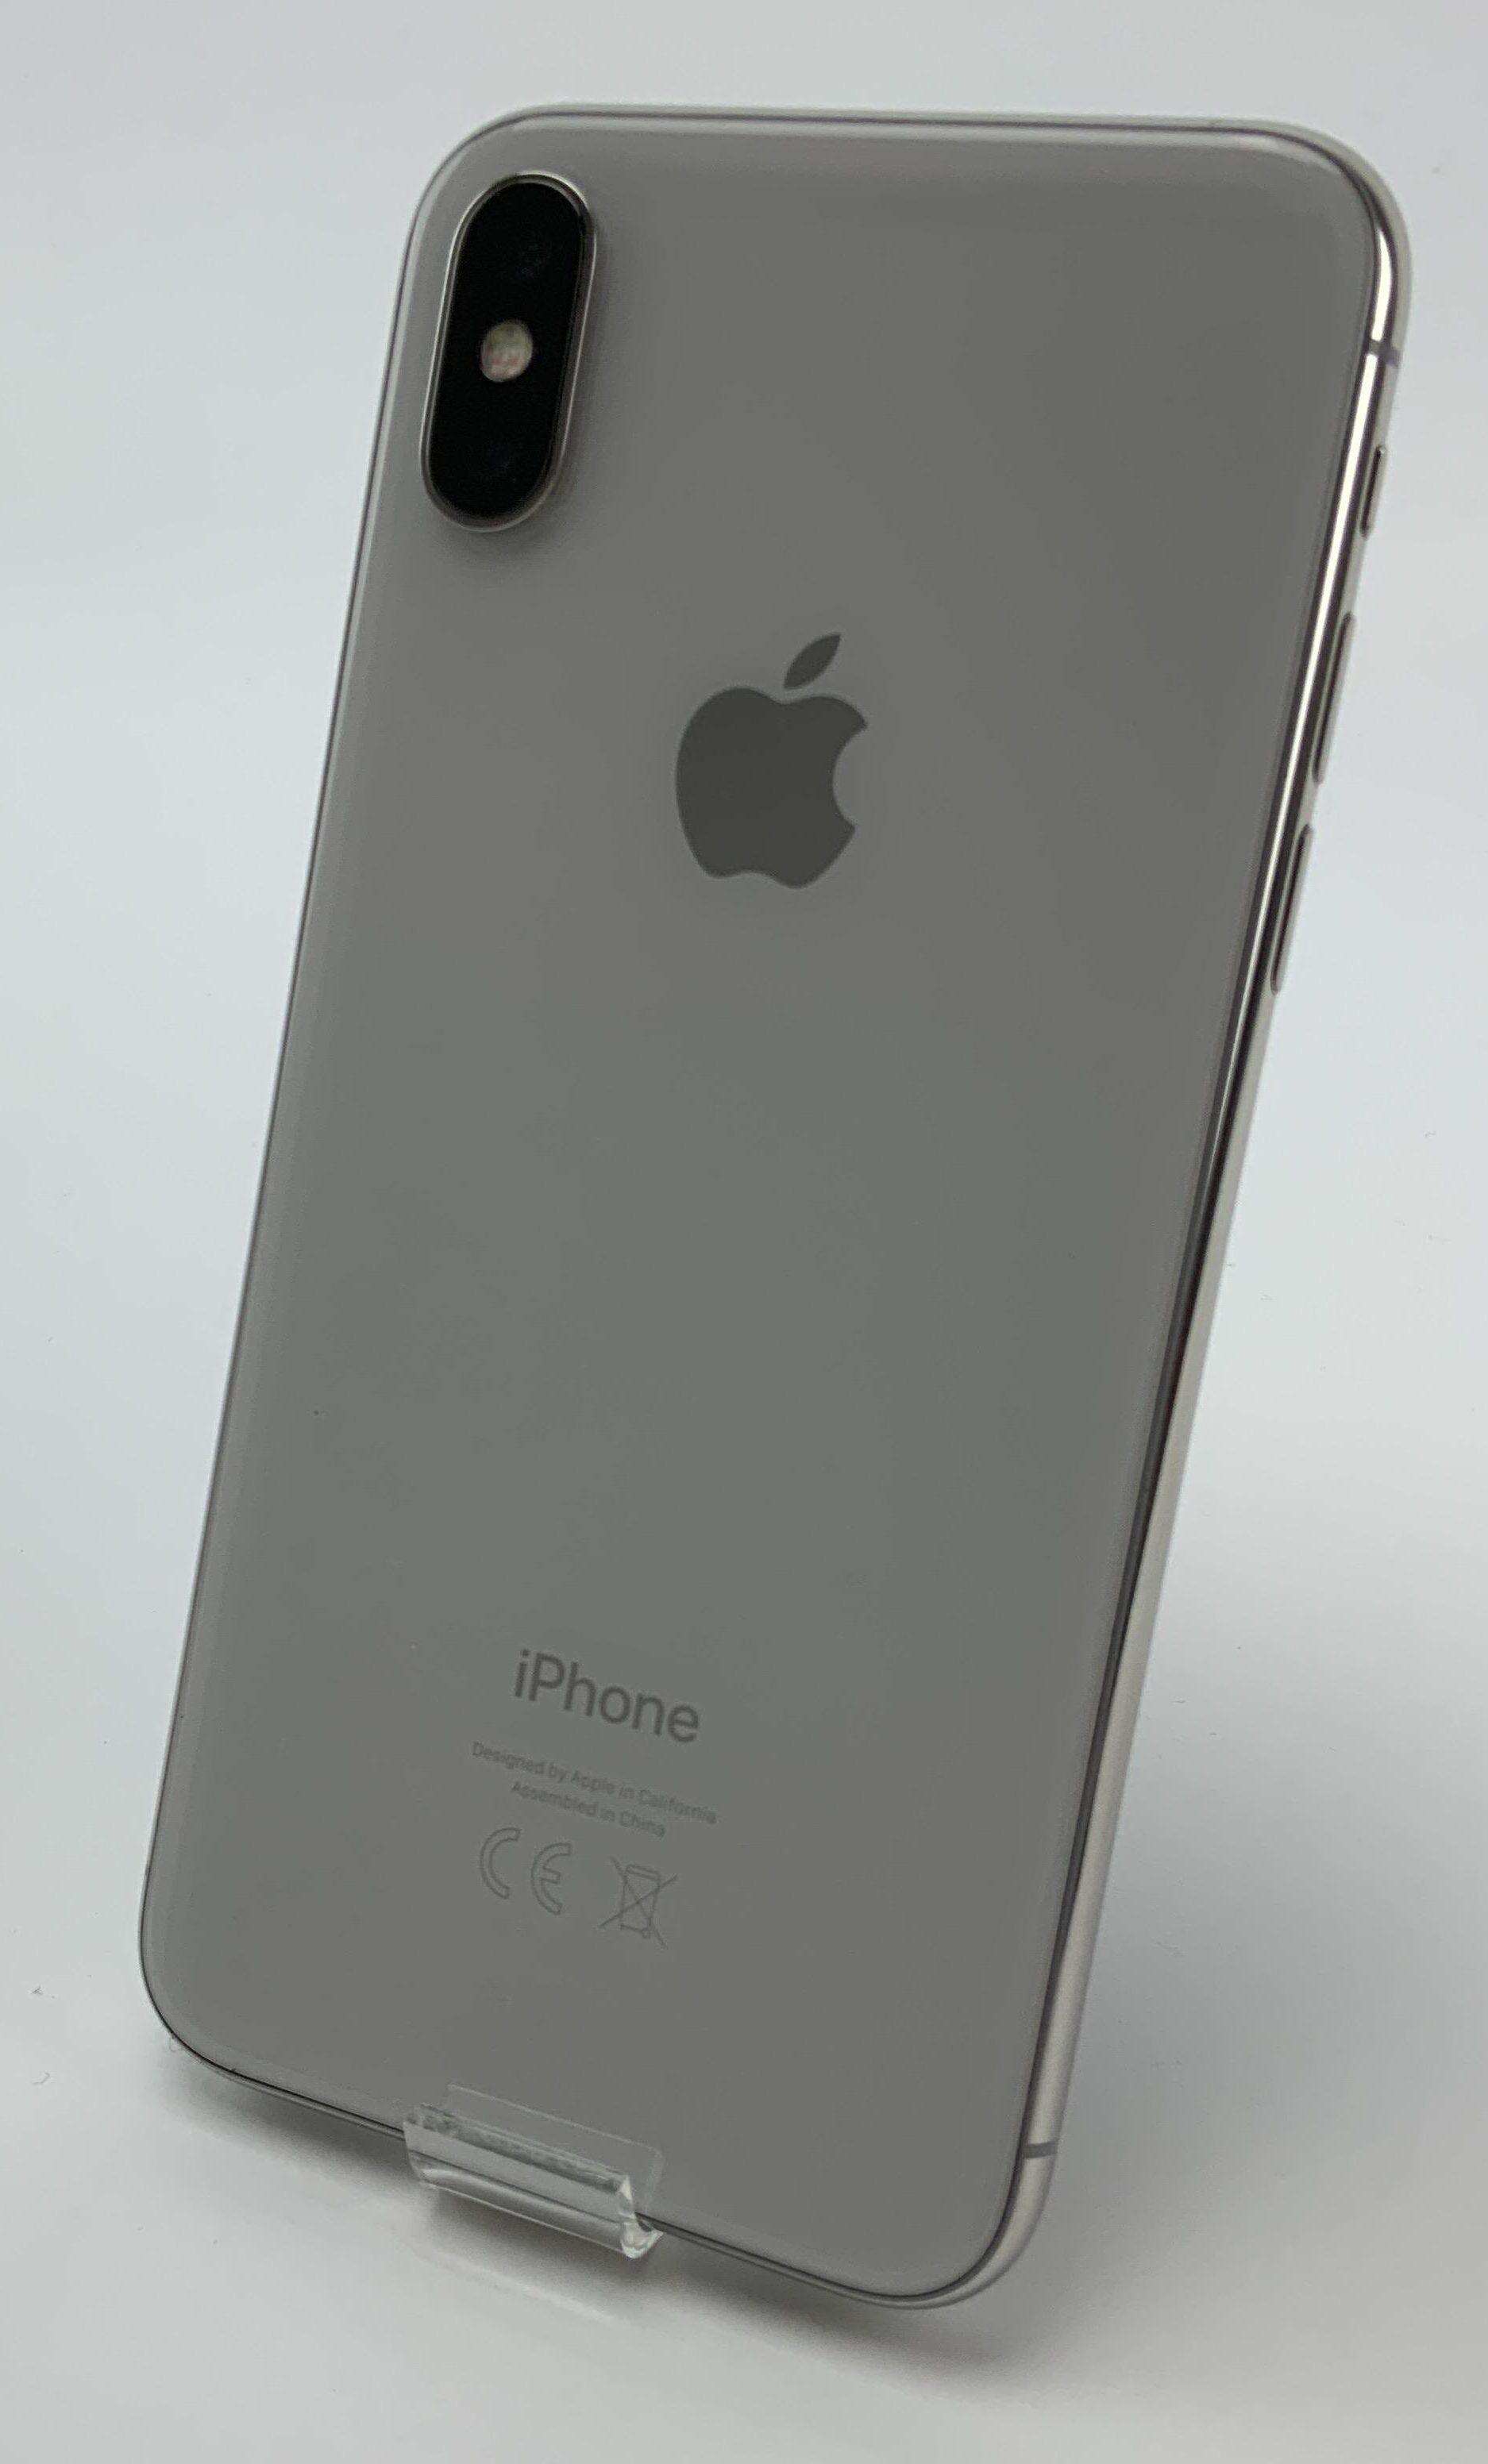 iPhone X 64GB, 64GB, Silver, imagen 2